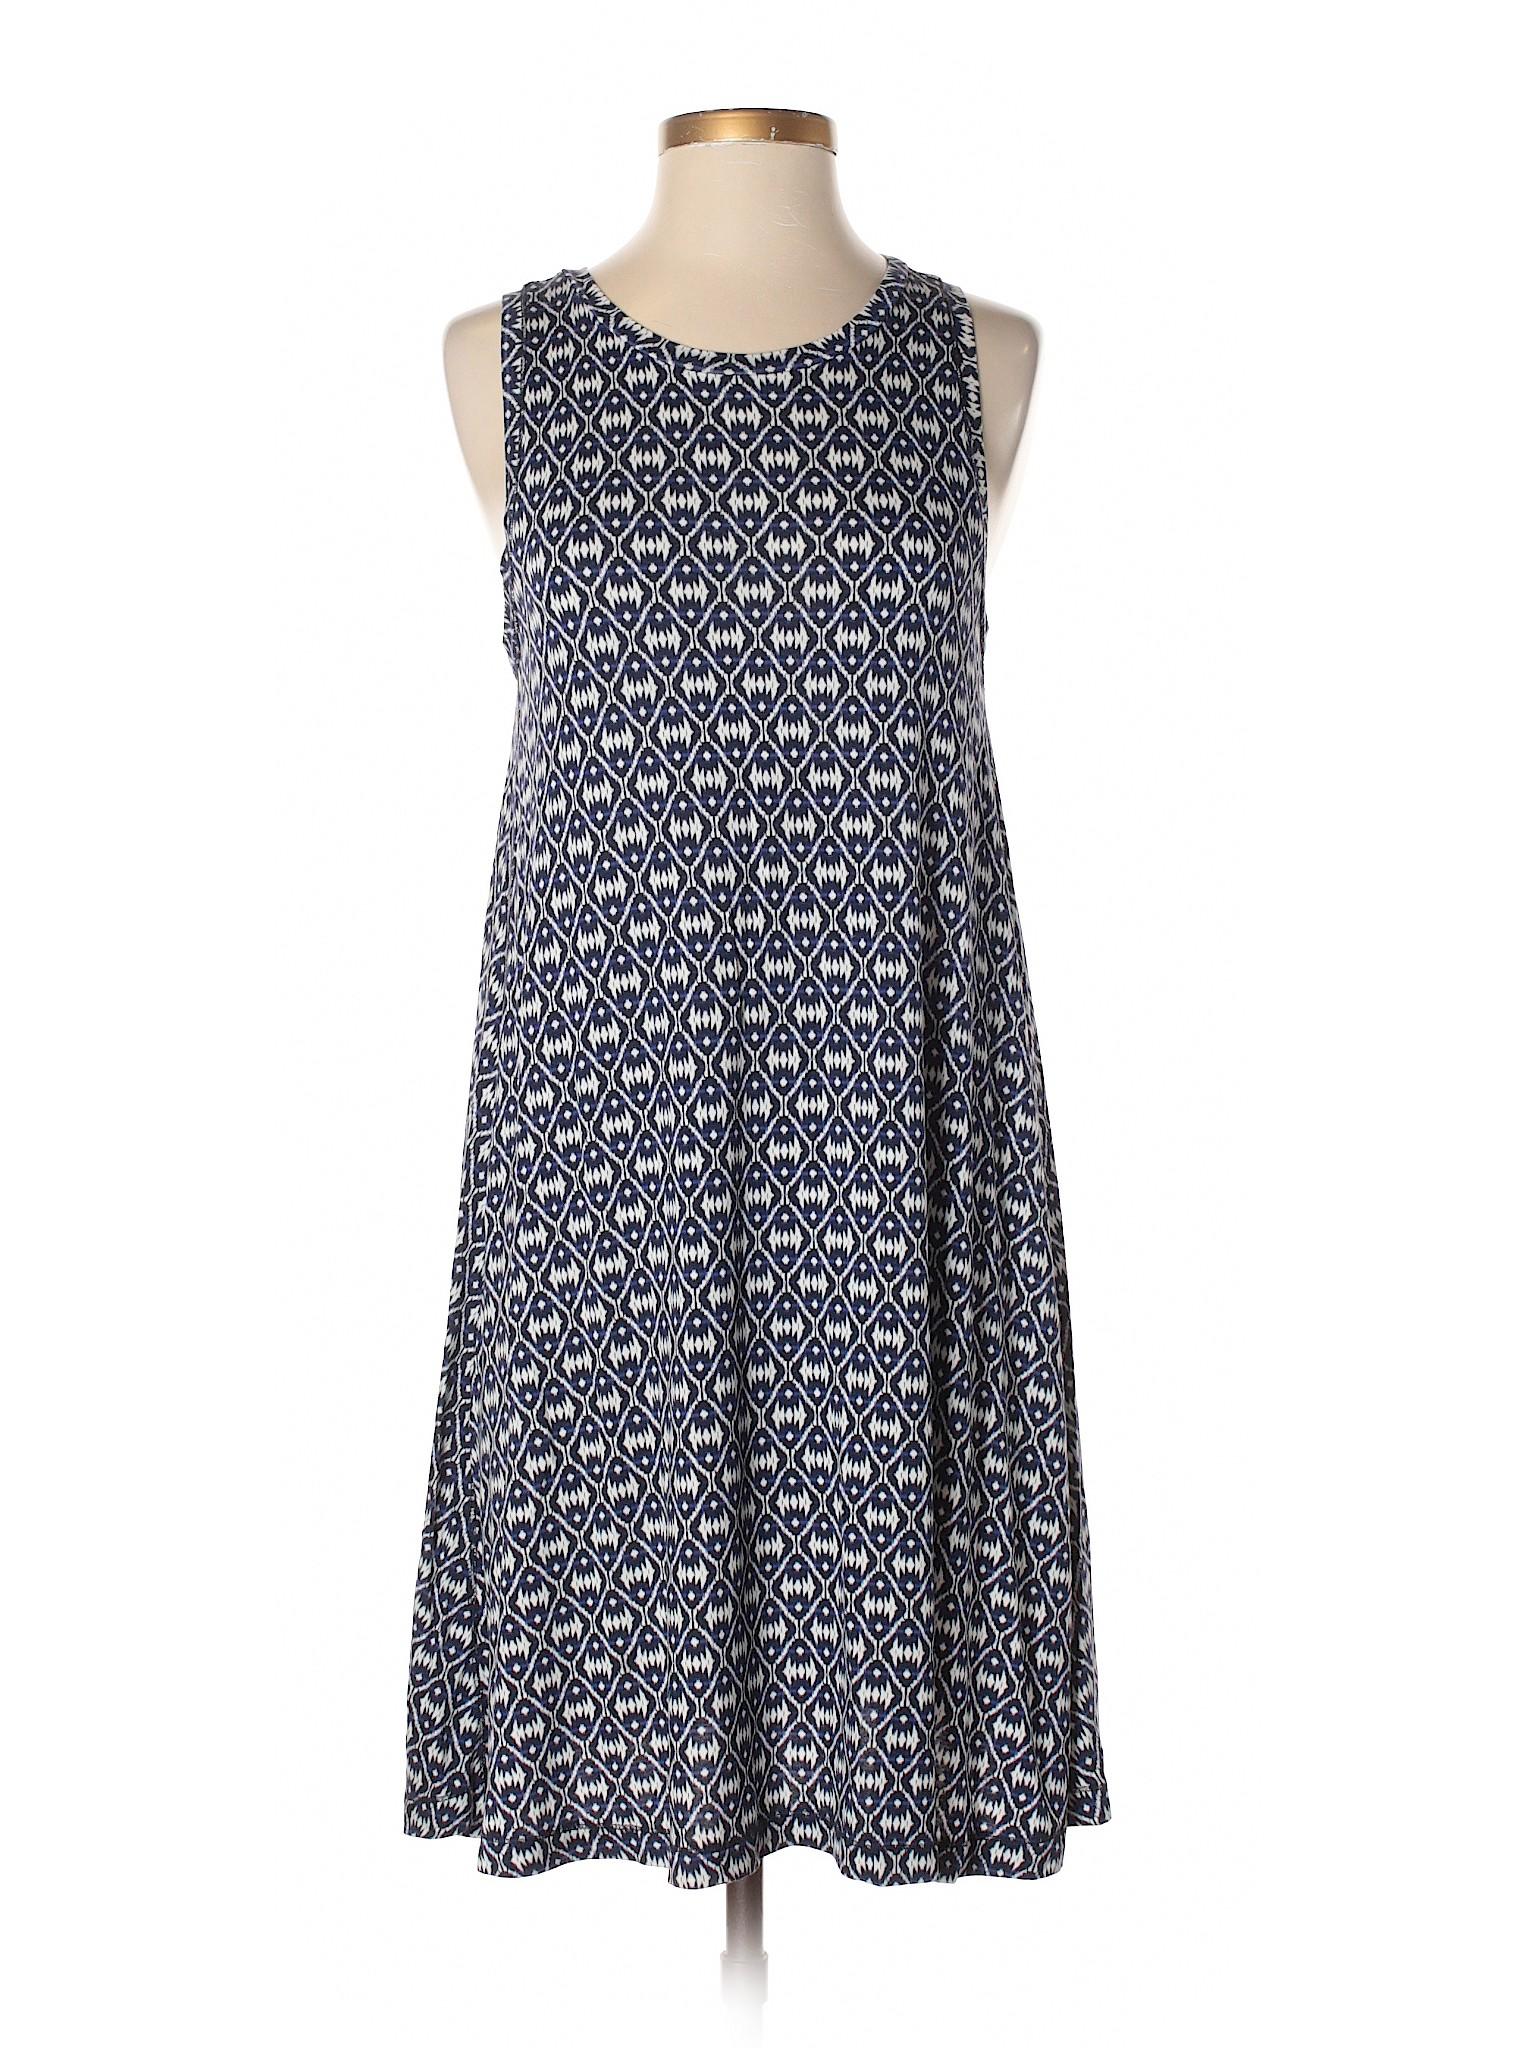 Ann Taylor LOFT Casual winter Dress Boutique PE75w